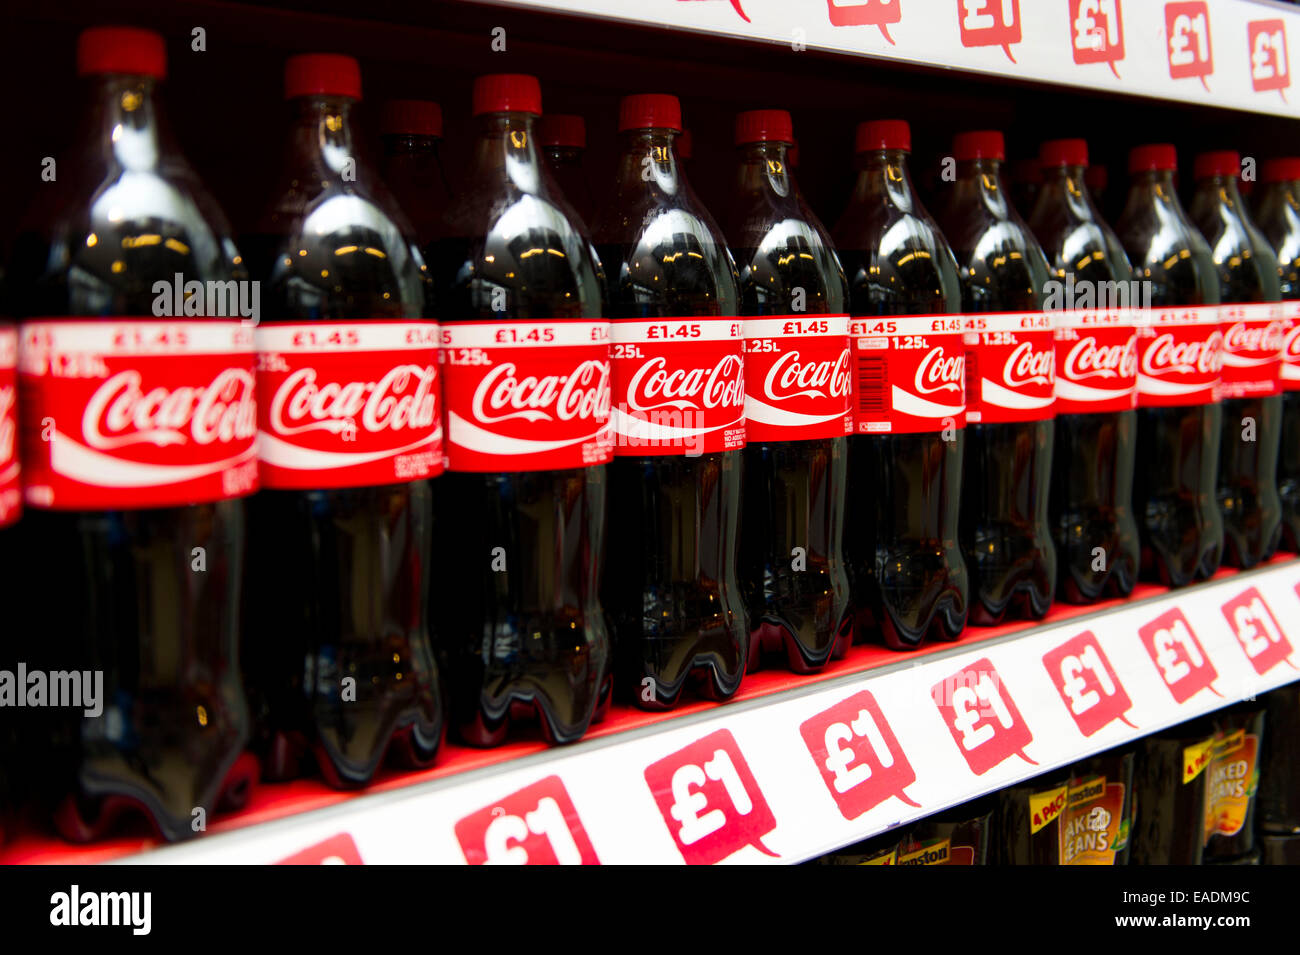 Coca cola coke bottles on sale in a supermarket. - Stock Image